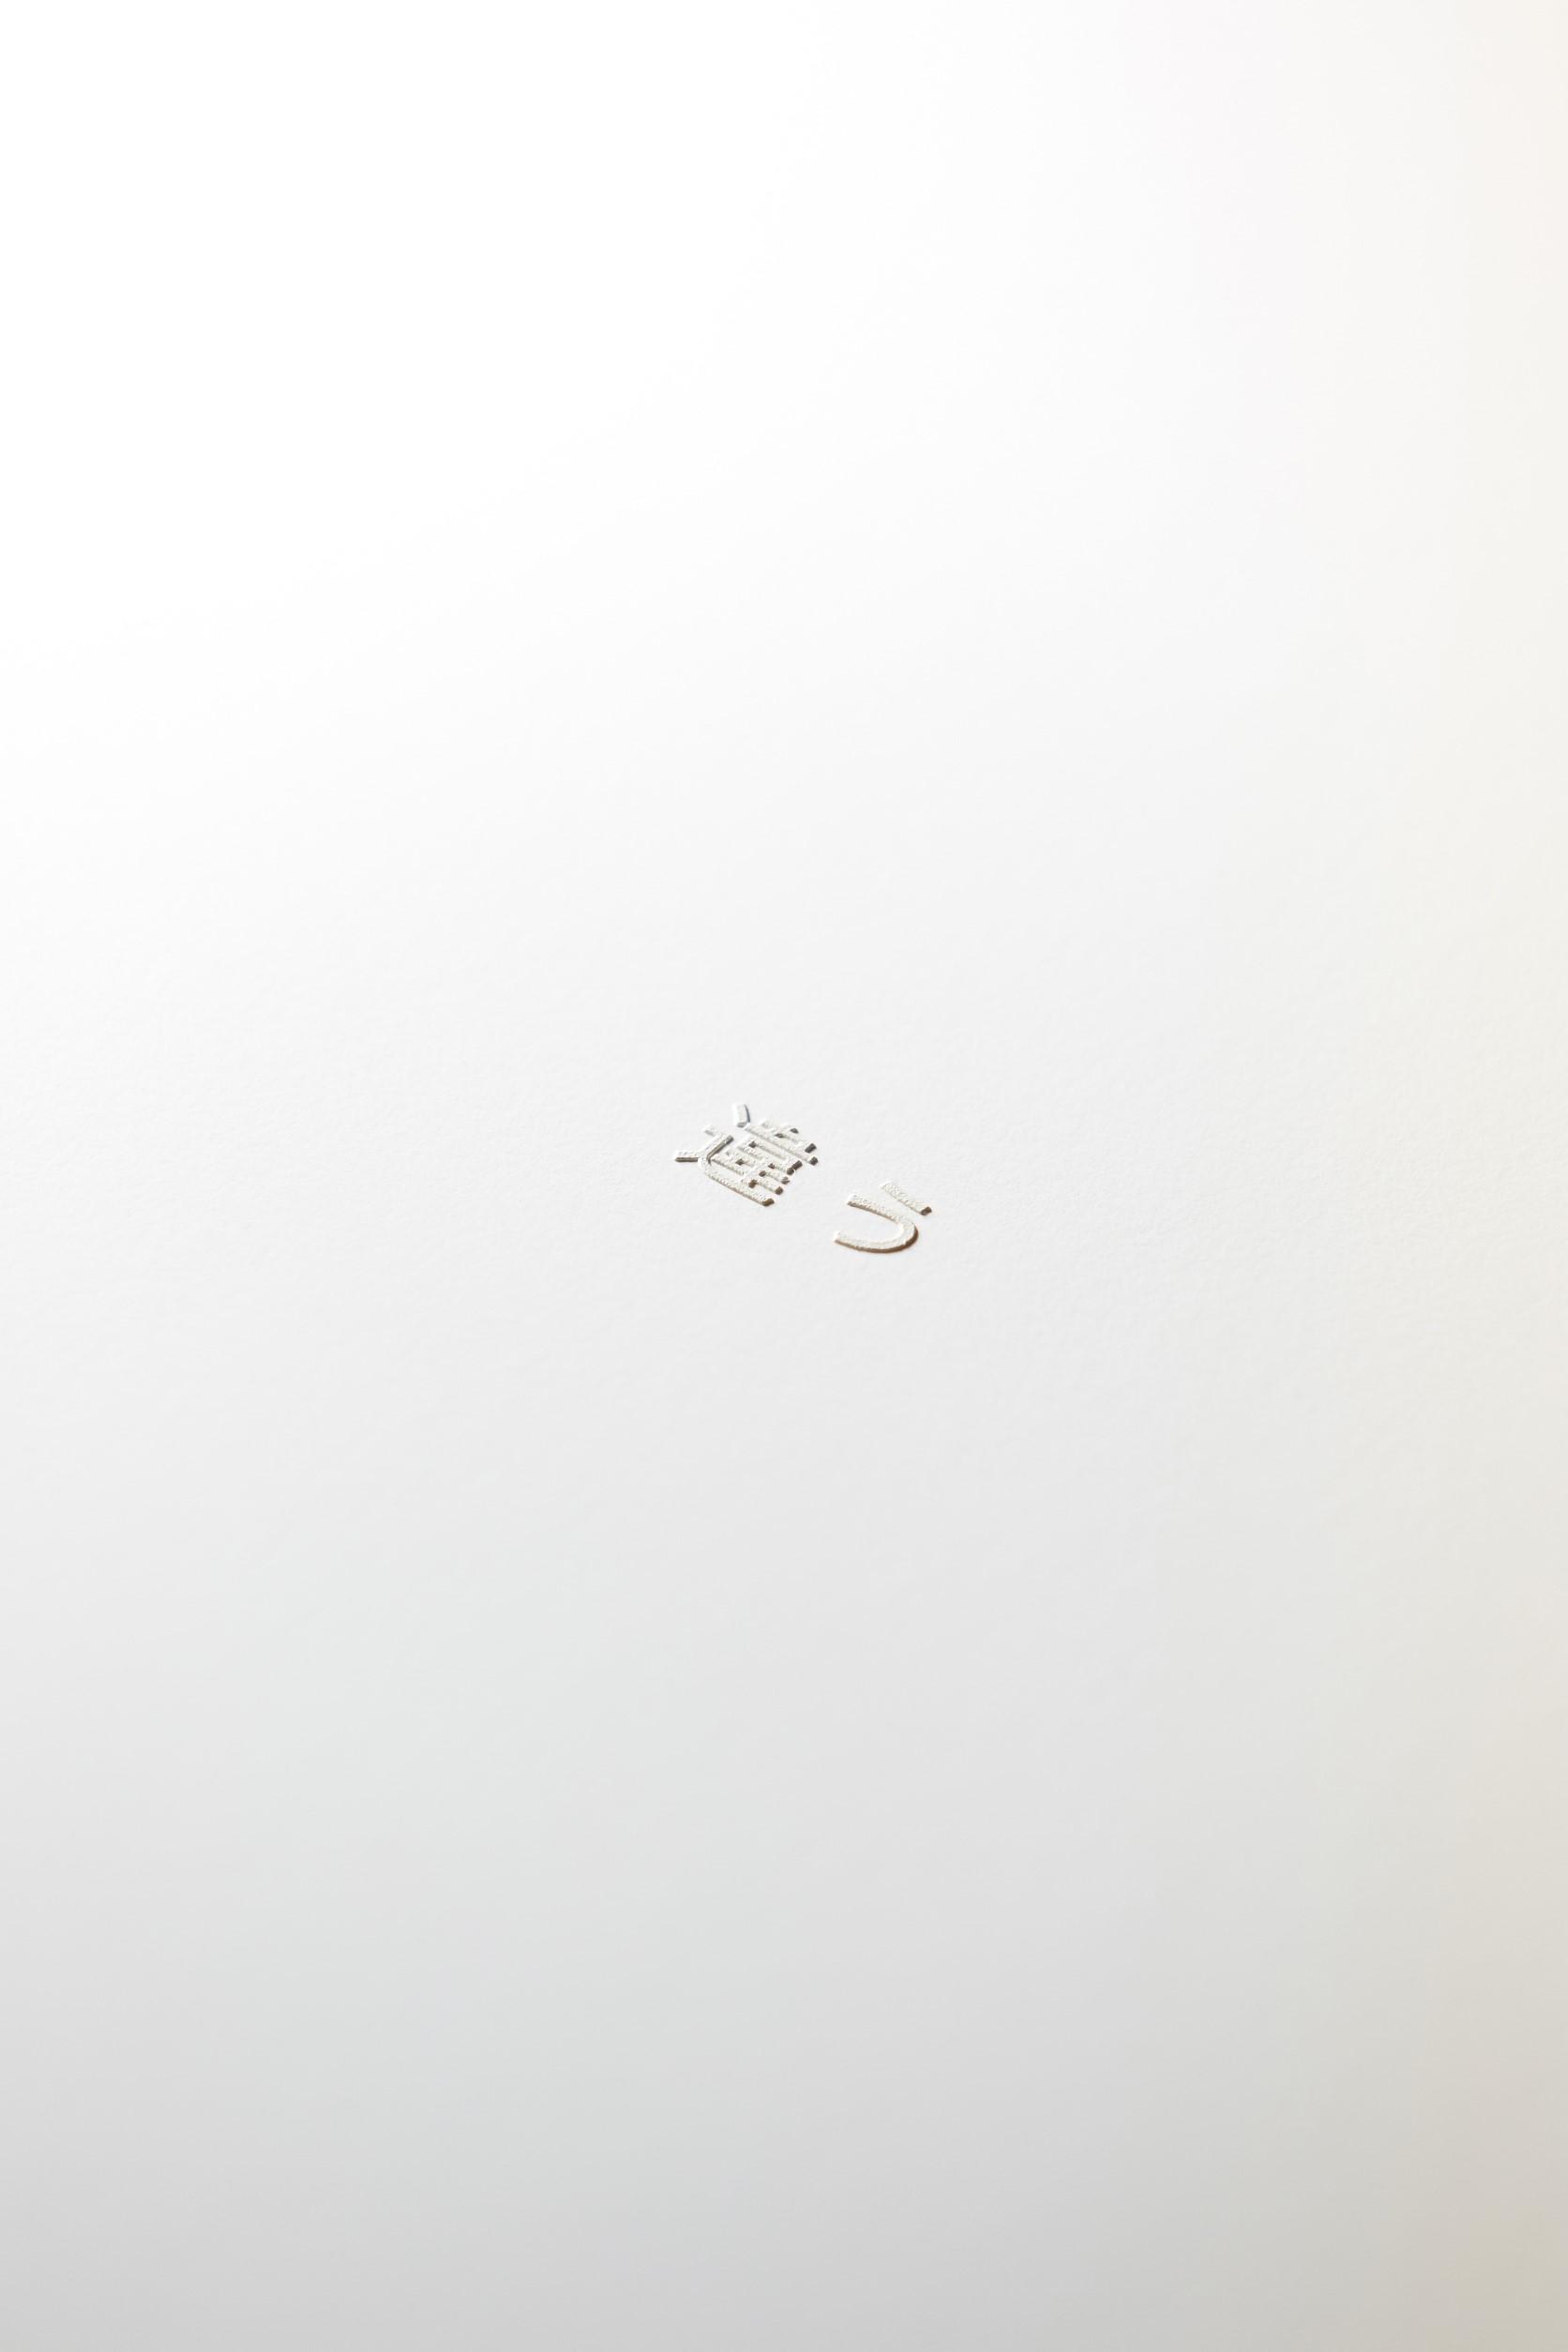 表参道 360°gallery <br /> 個展『言葉の記憶』